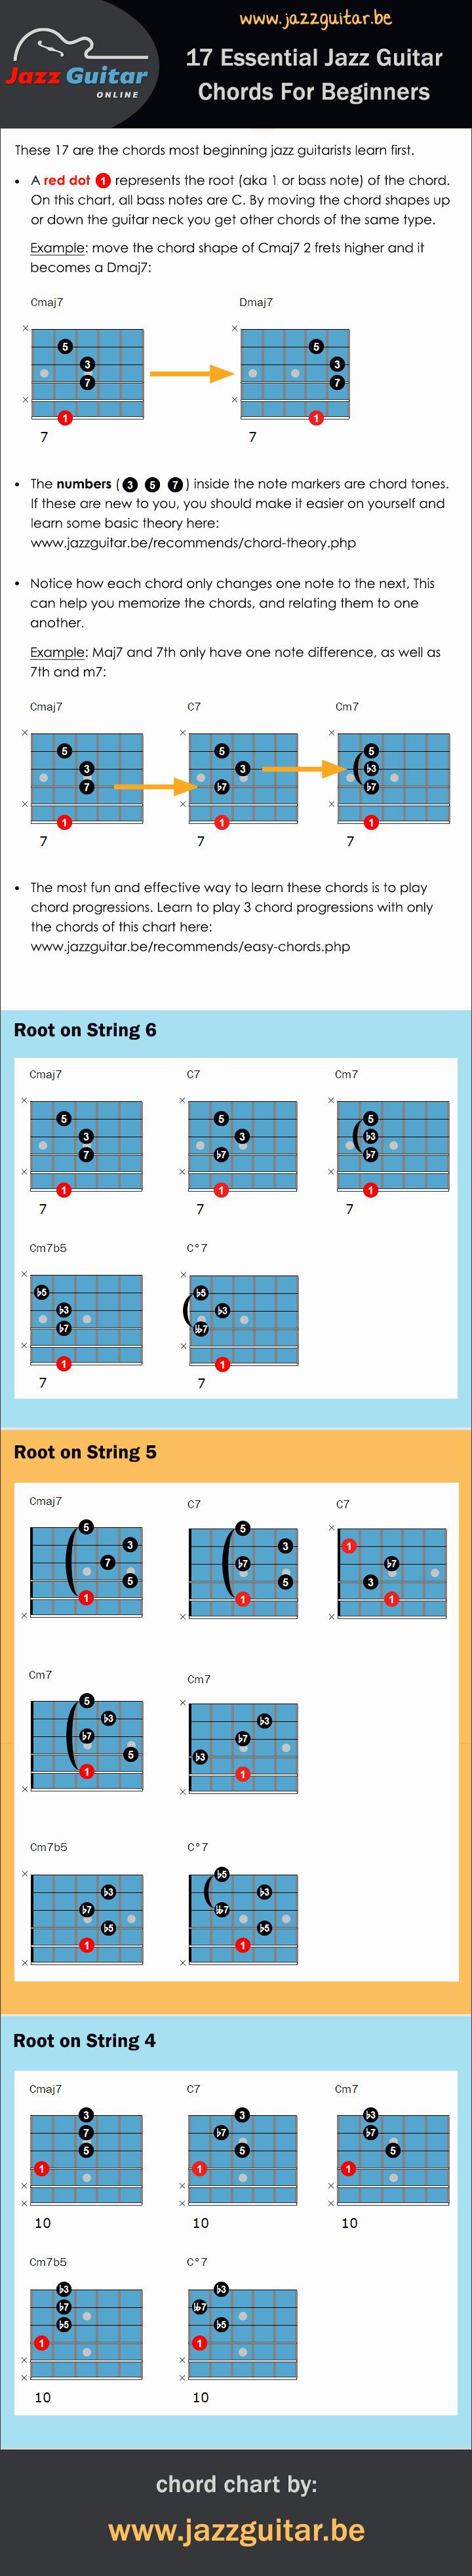 Guitar Chords for Beginners Fresh Easy Jazz Guitar Chords Tabs & Chord Charts